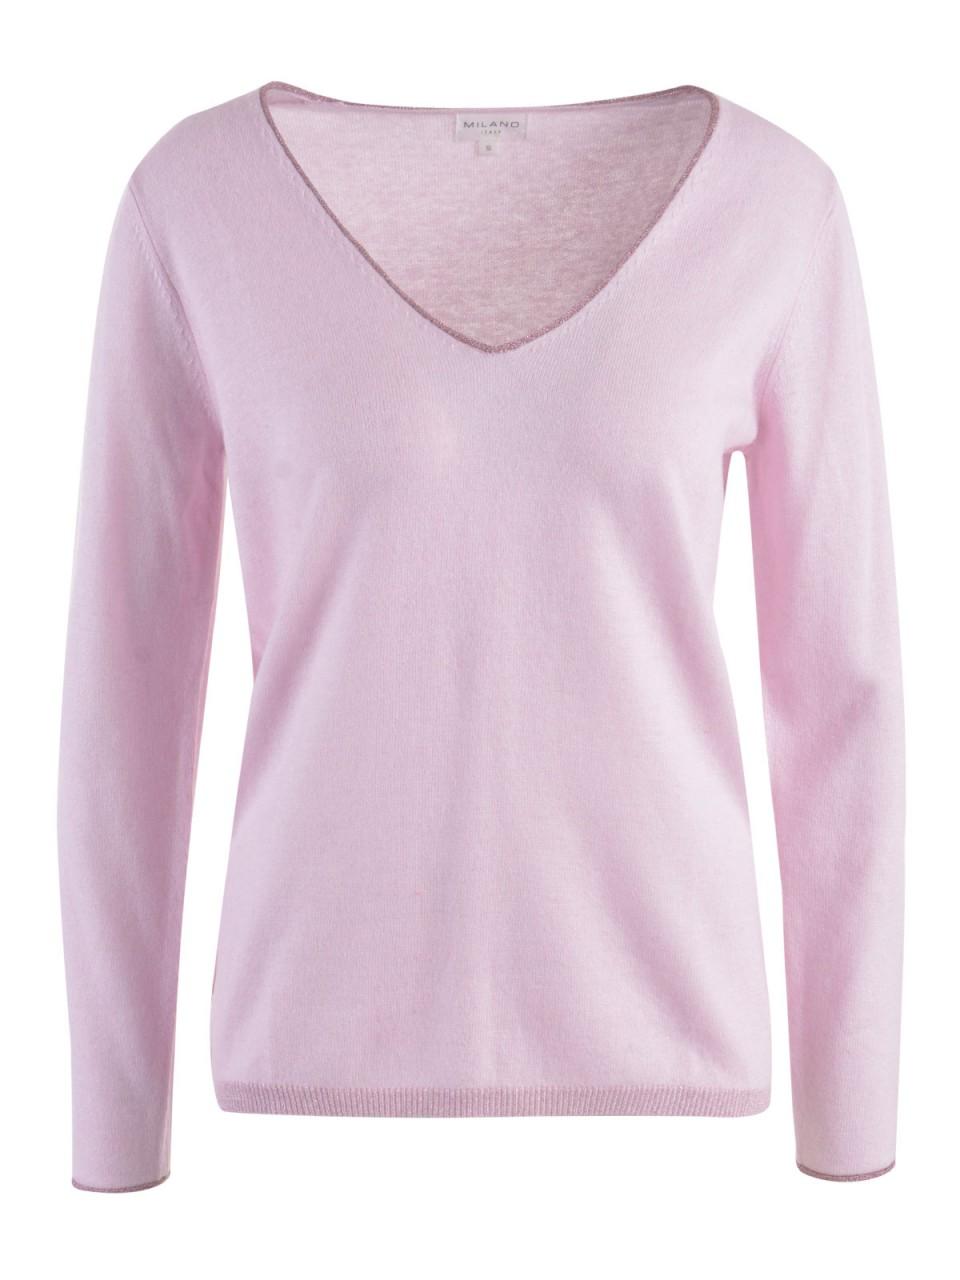 milano-italy-damen-pullover-rosa